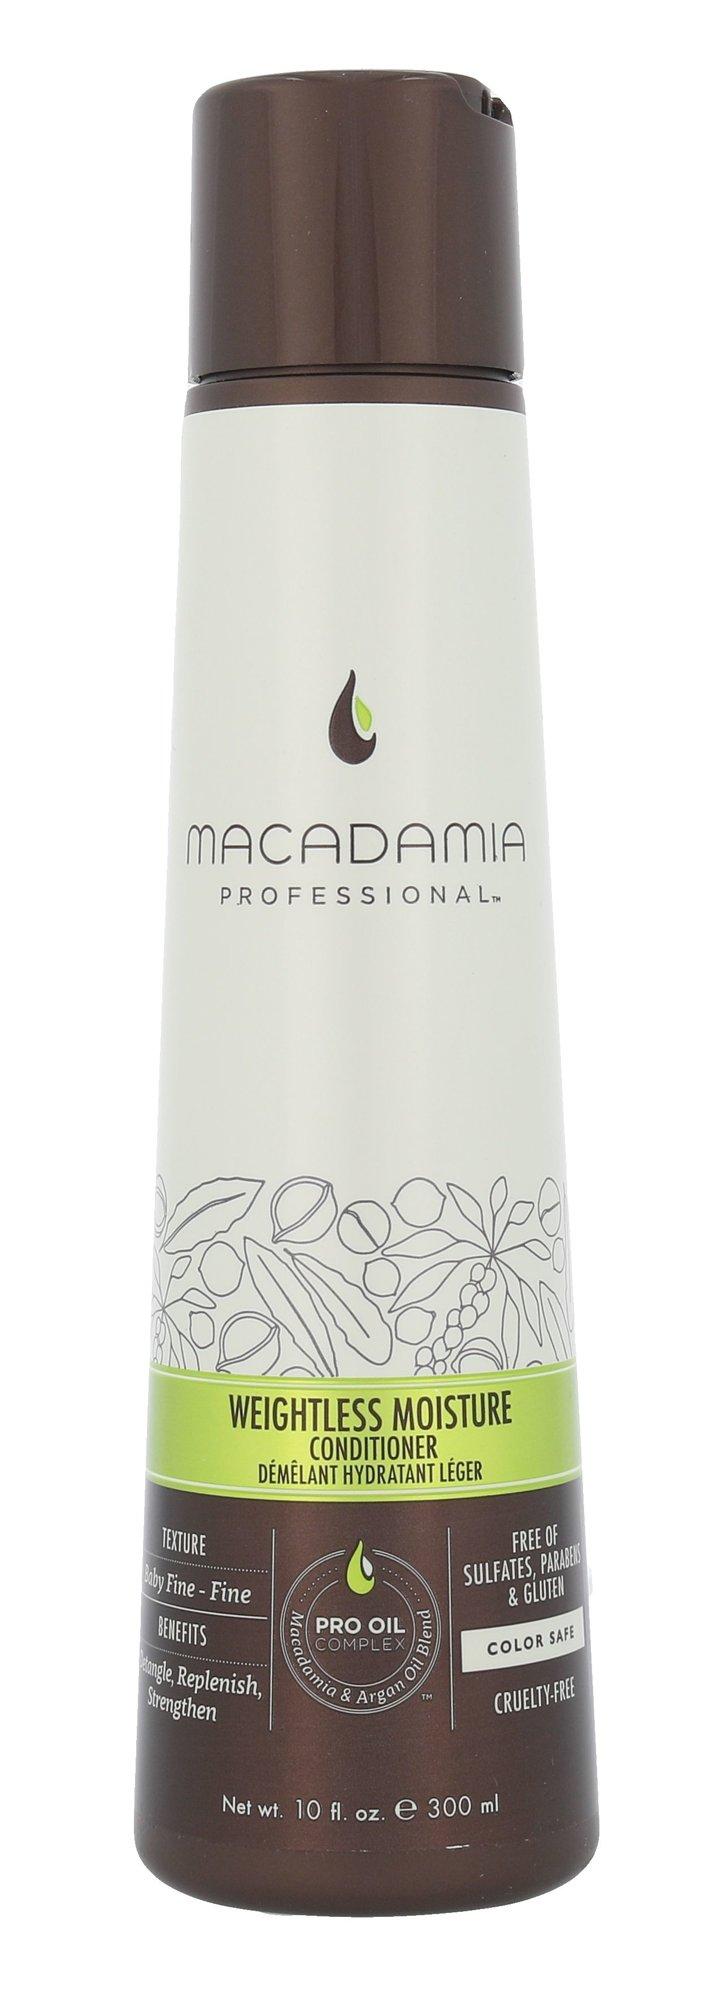 Macadamia Professional Weightless Moisture Cosmetic 300ml